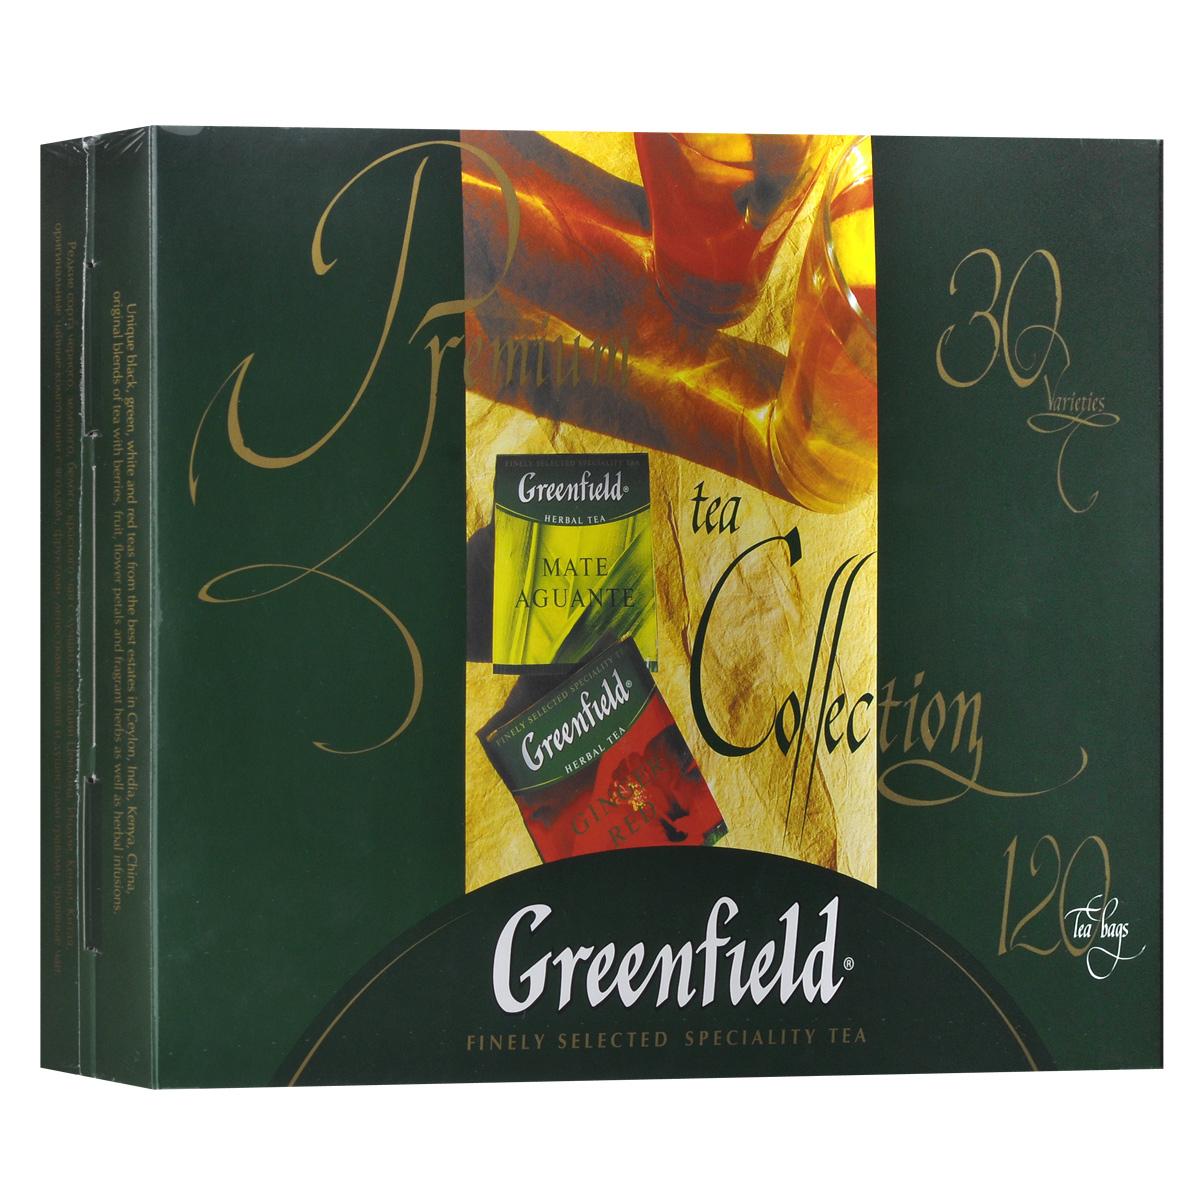 greenfield красный чай: